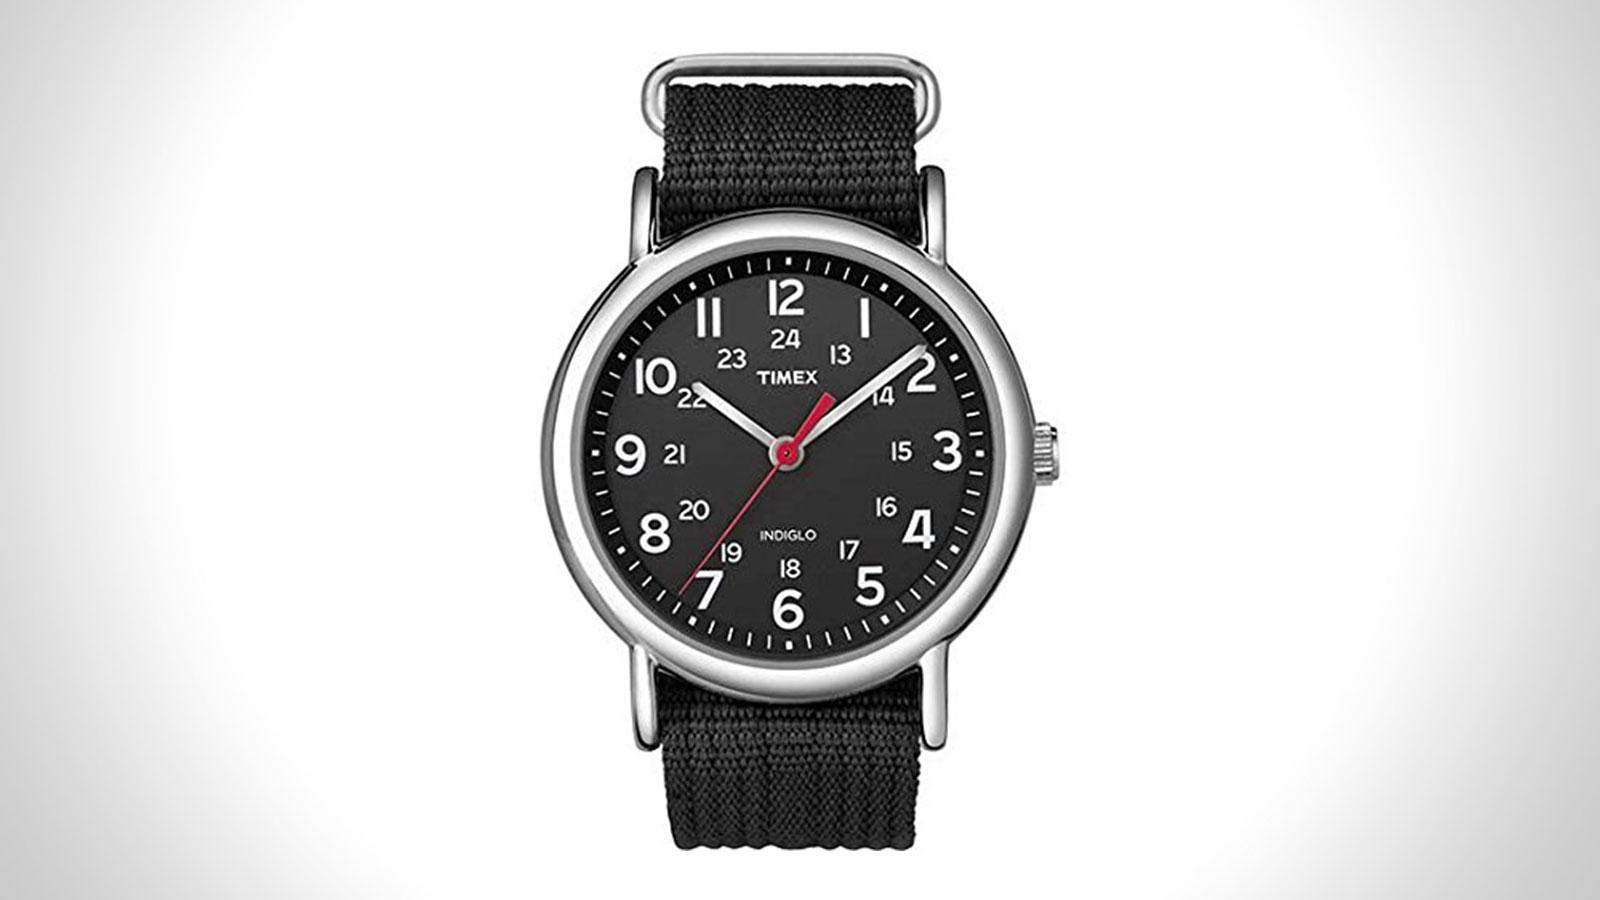 Timex Weekender Mens Field Watch | the best mens field watch